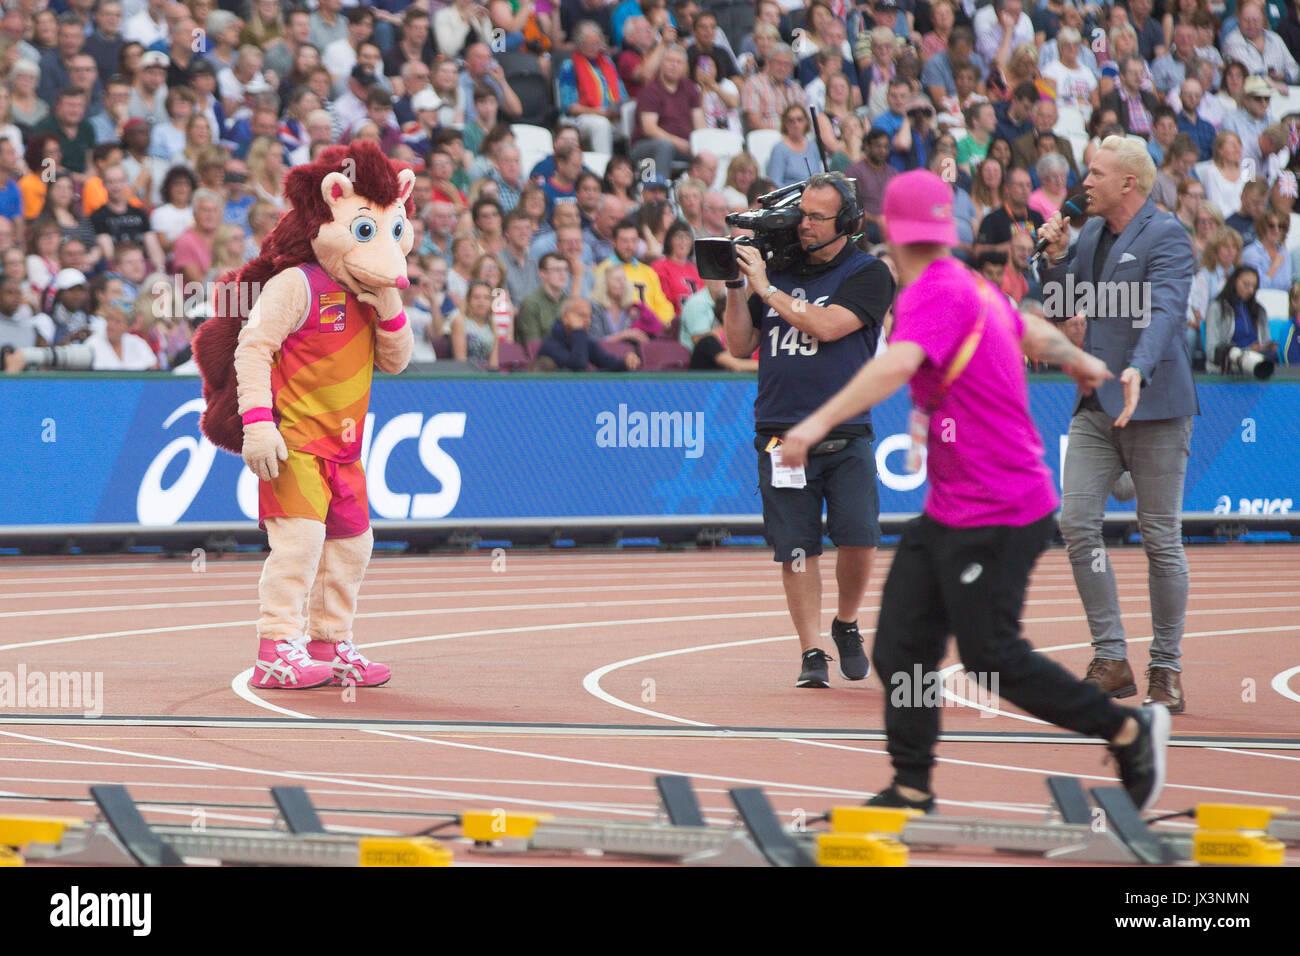 London Stadium, East London, England; IAAF World Championships; Hero the Hedgehog Mascot entertaining the fans on August 12th 2017. - Stock Image